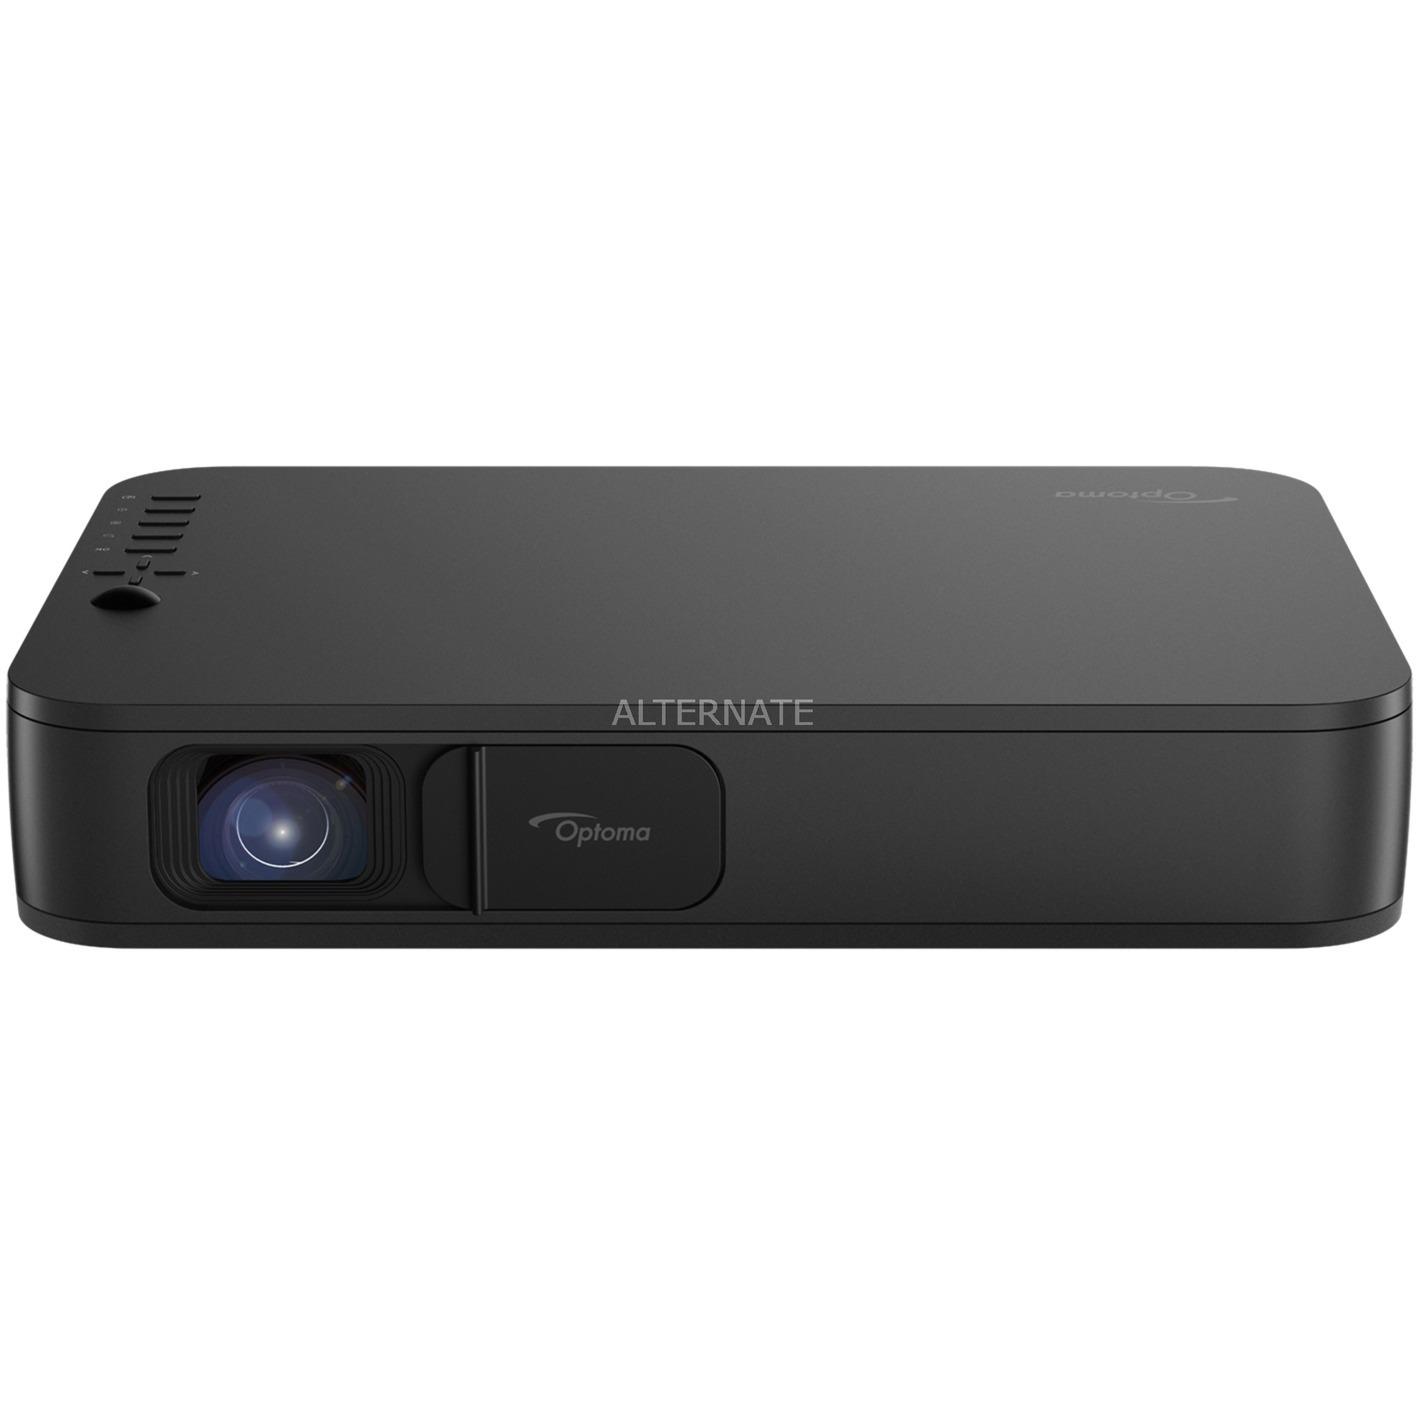 LH160 videoproyector 1500 lúmenes ANSI DLP 1080p (1920x1080) 3D Proyector portátil Negro, Proyector DLP